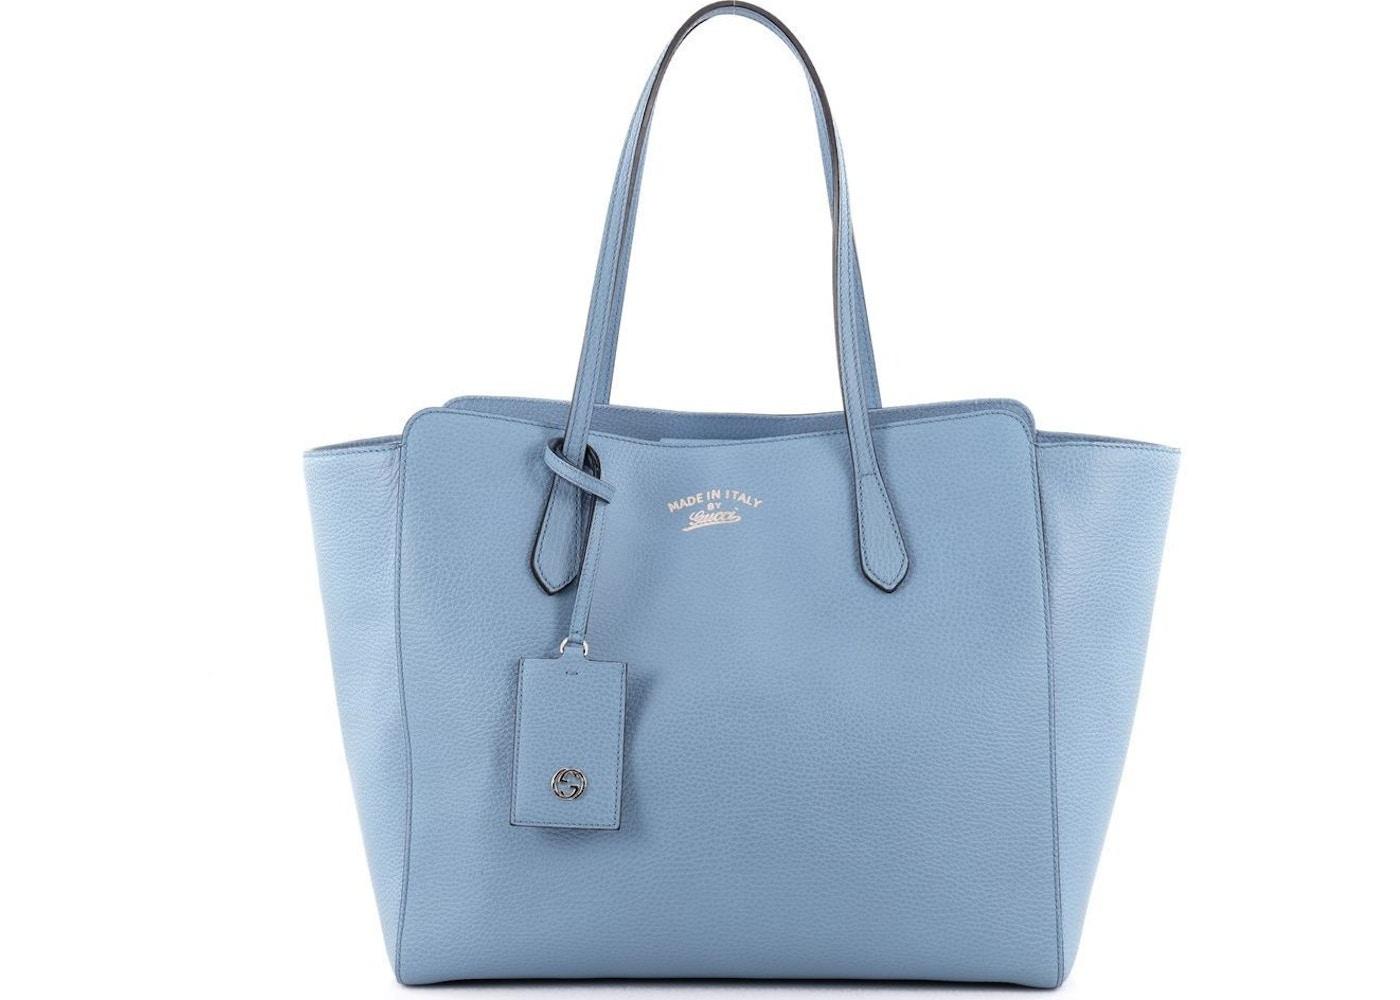 8b43d5cab100 Gucci Swing Tote Medium Blue. Medium Blue